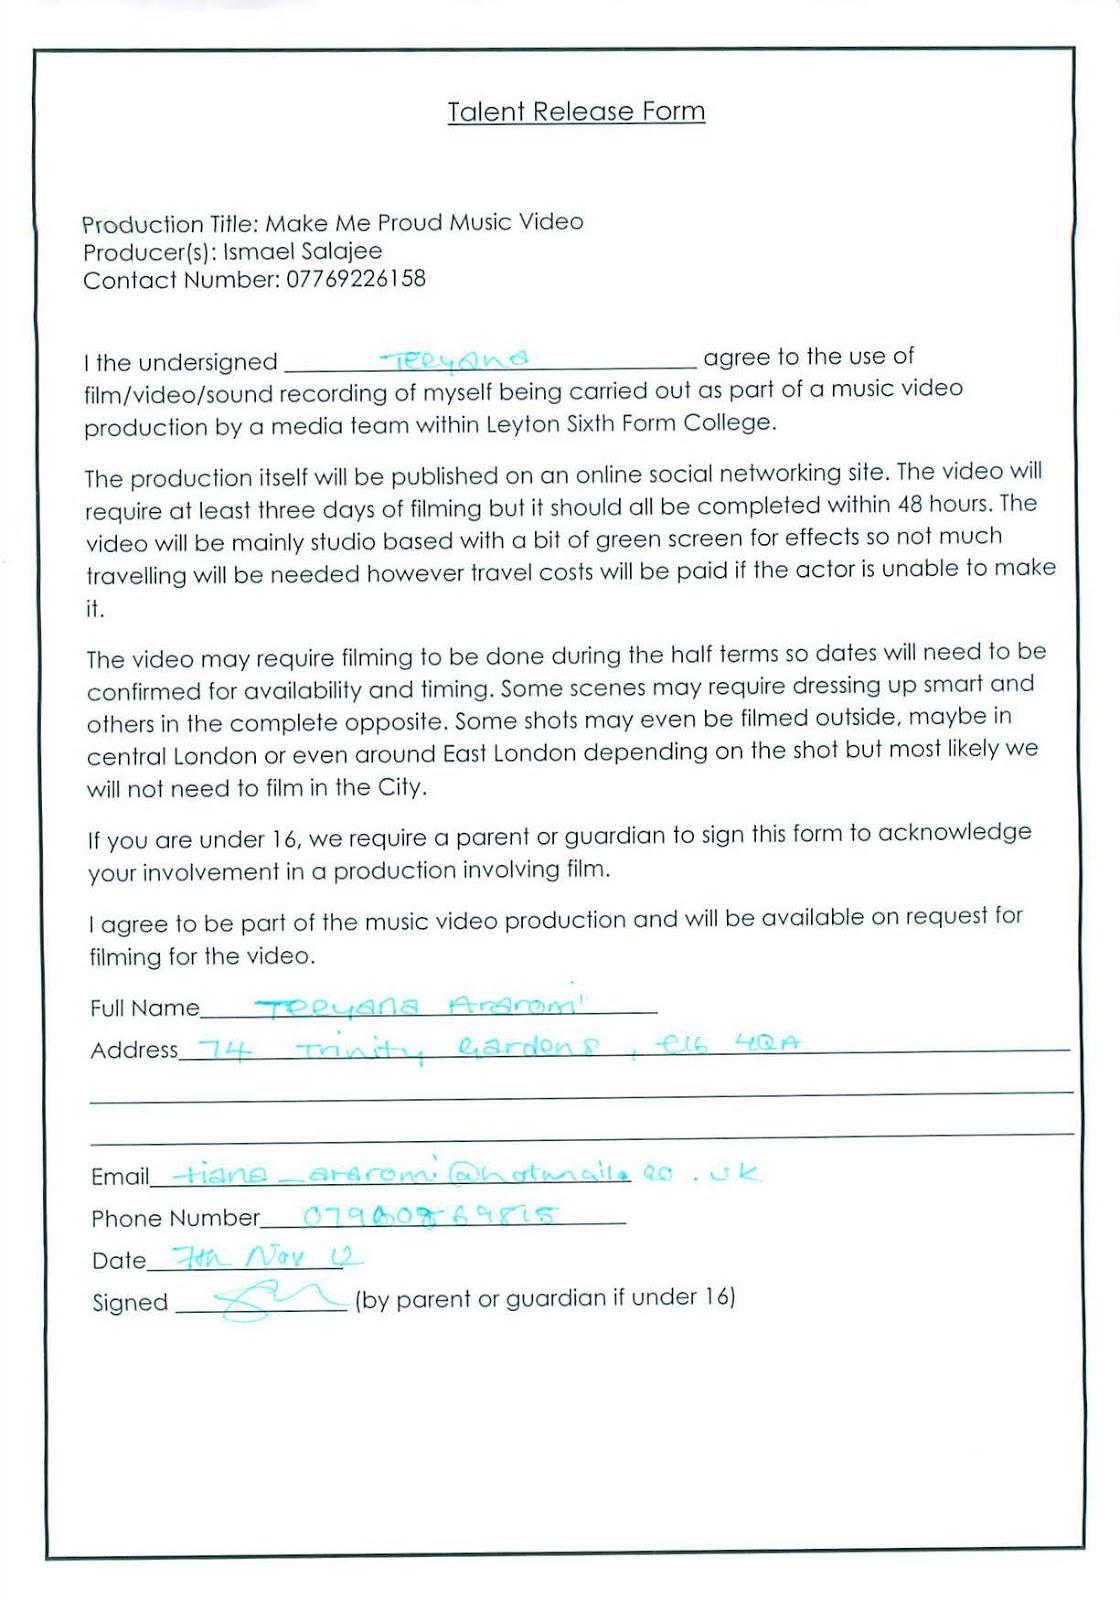 Parths Blog Nickis Talent release form update – Talent Release Form